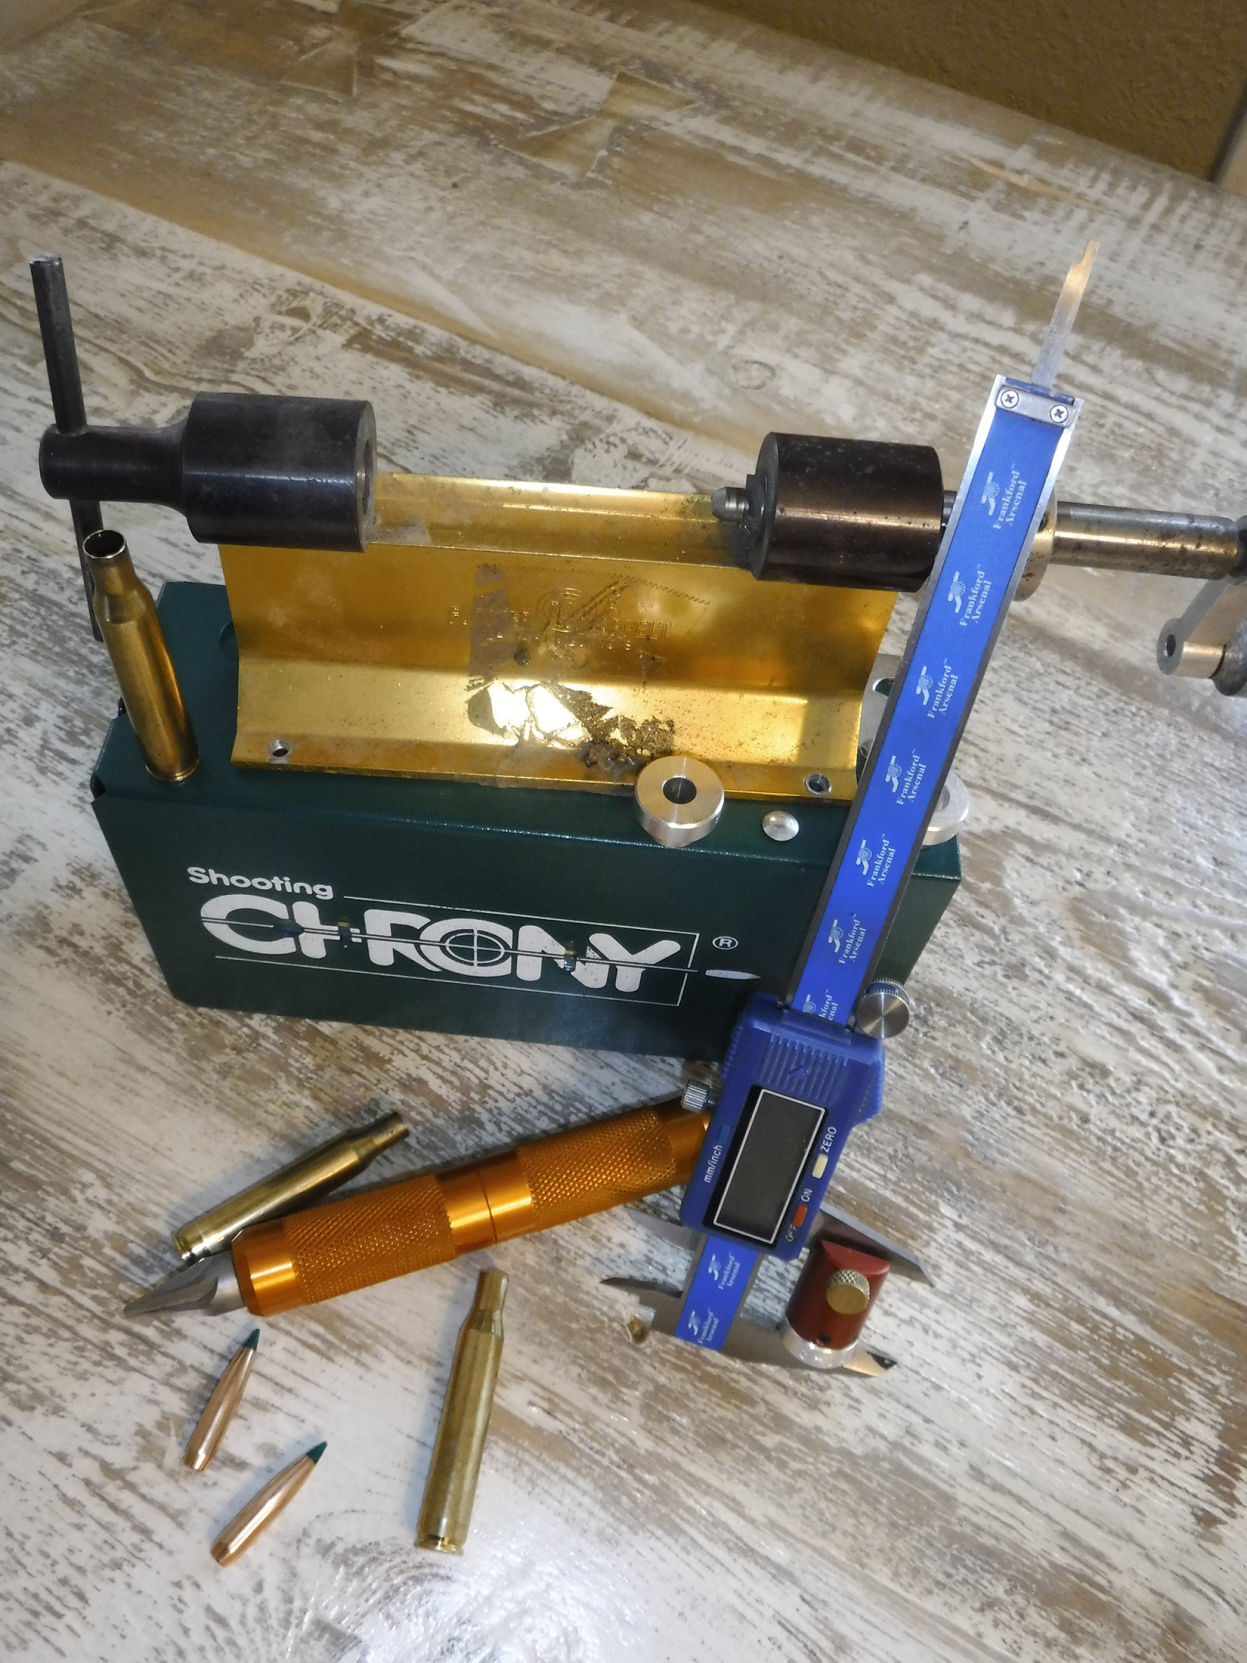 bullet jacket trimming tool